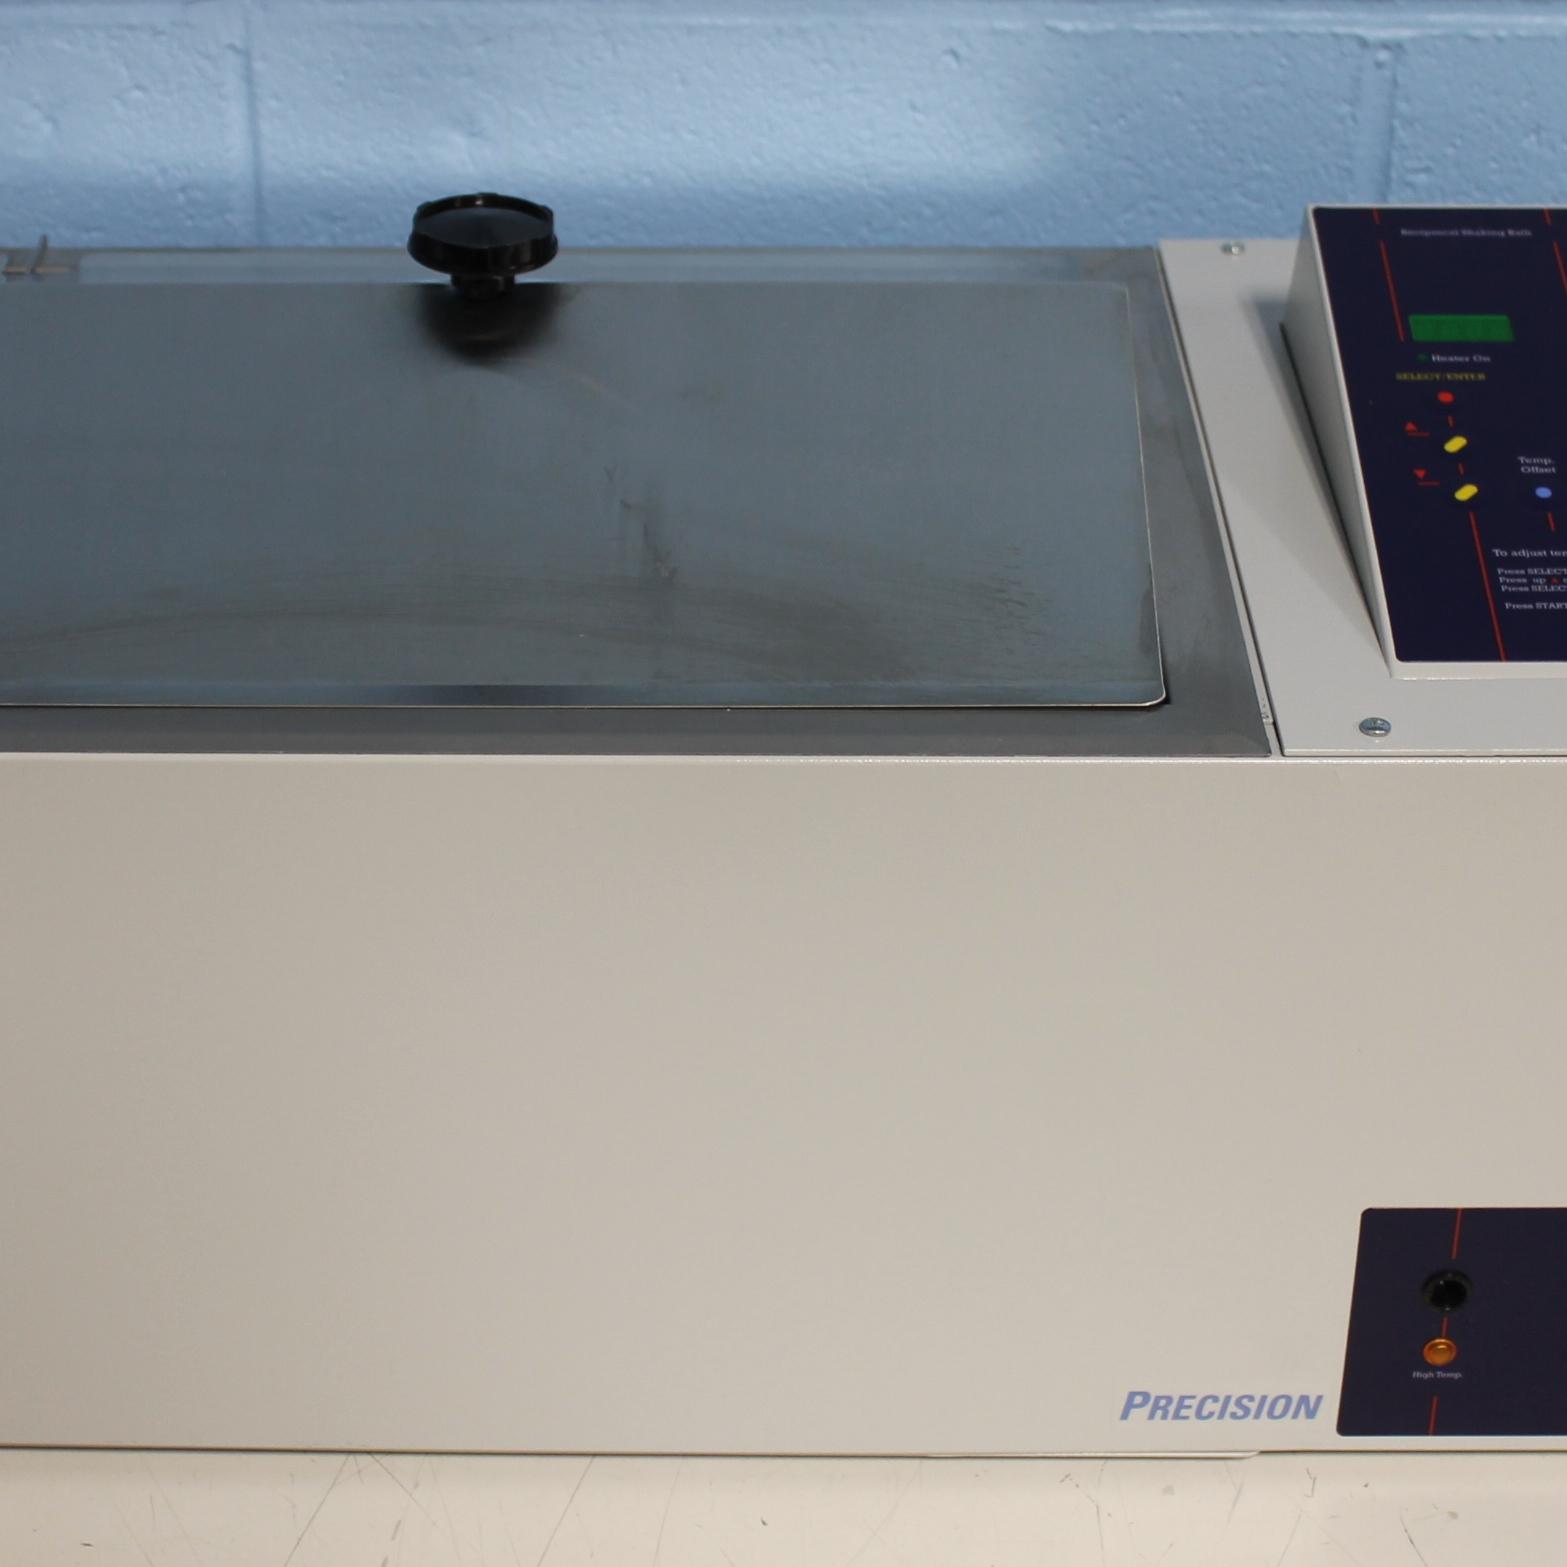 Thermo Scientific Precision Digital Reciprocating Shaking Water Bath Model 25 Image